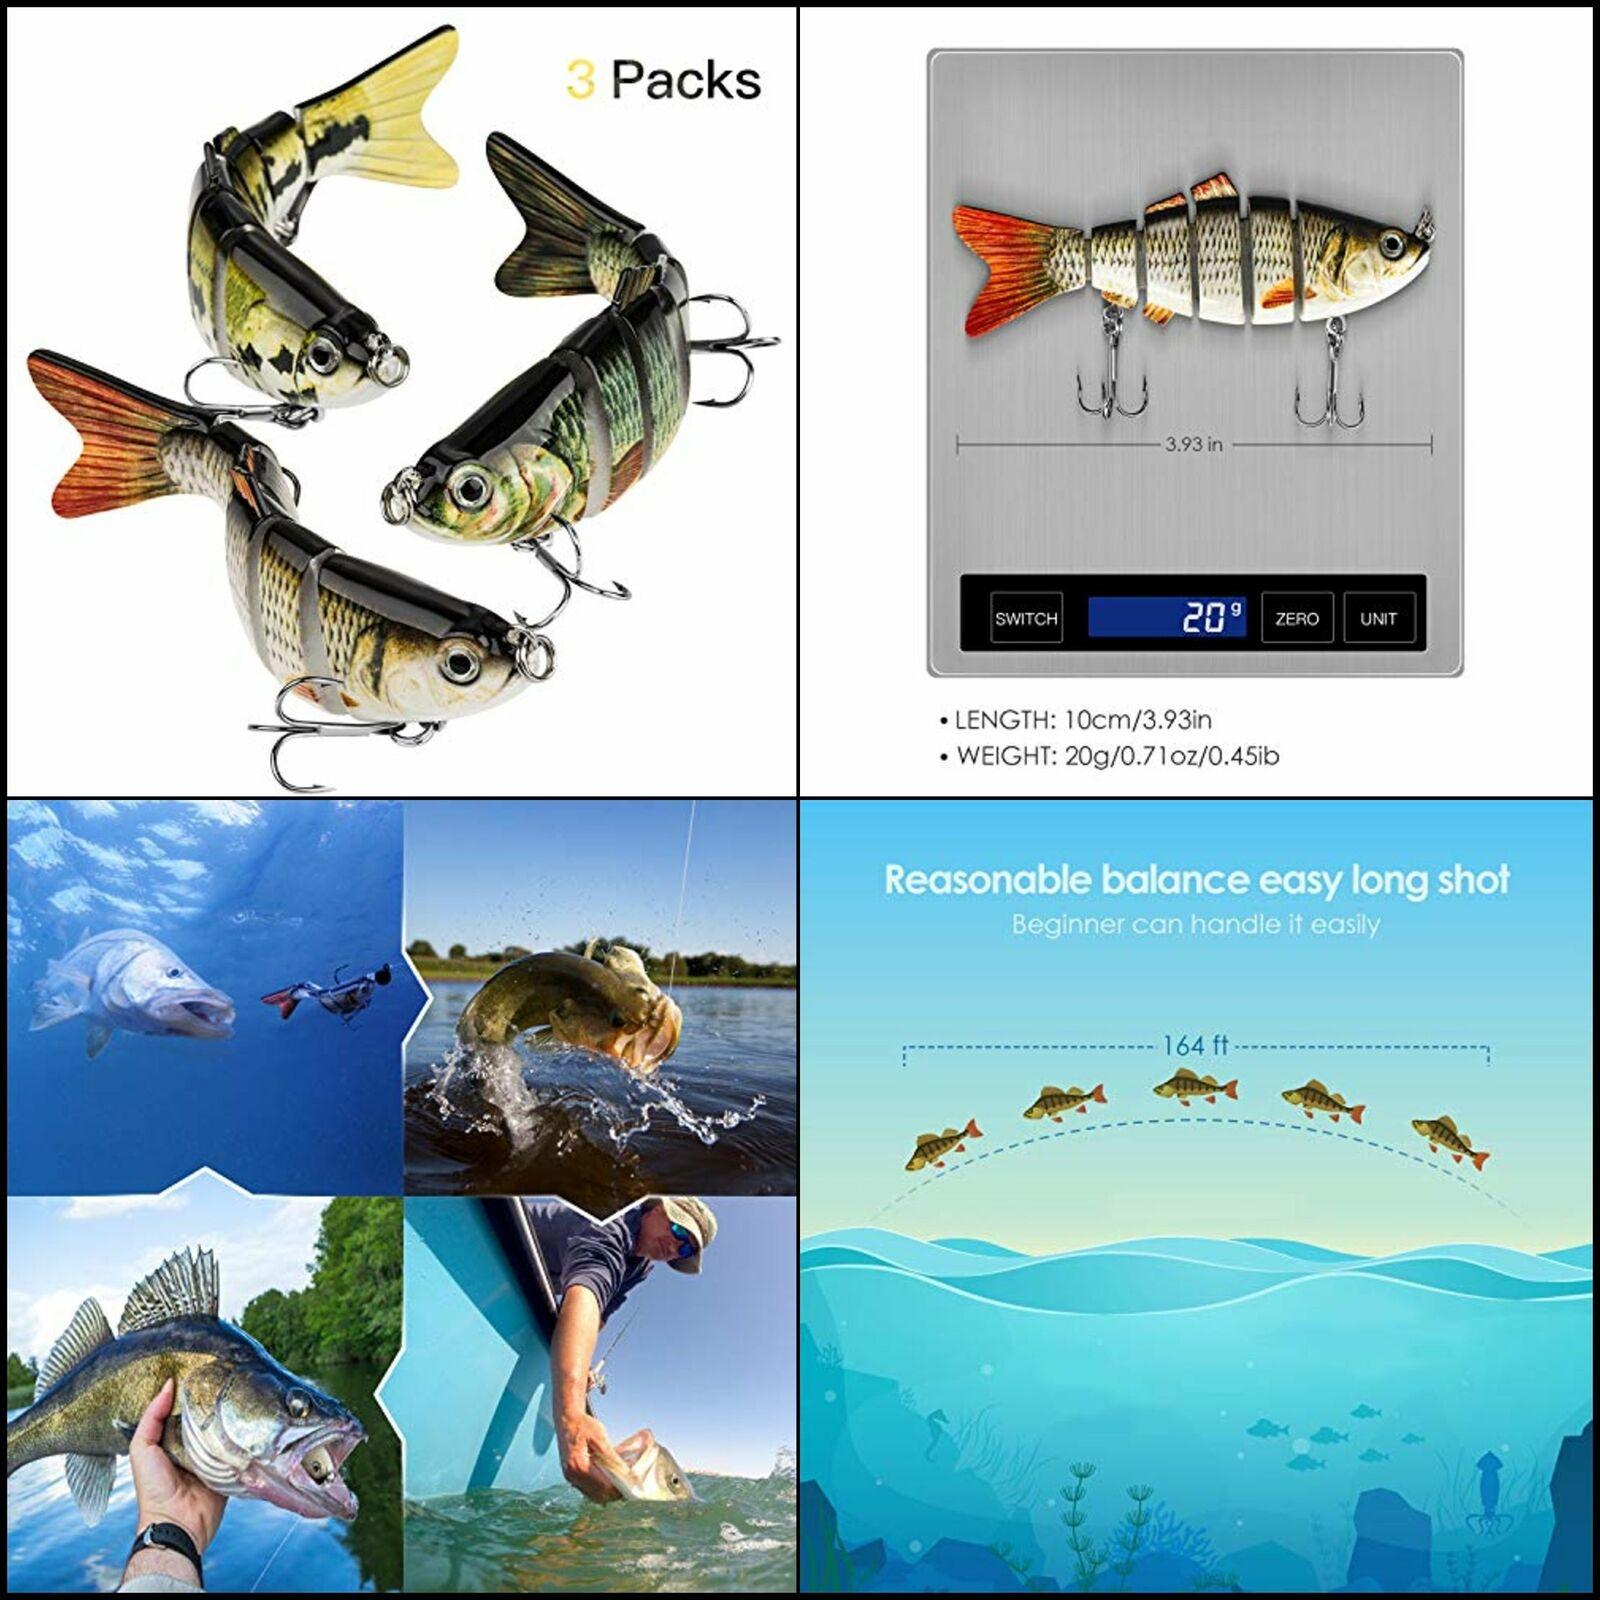 9 Set 9 Size Fishhooks for Swivel Fishing String Hook Fish Skin Fishy Smell B1B4